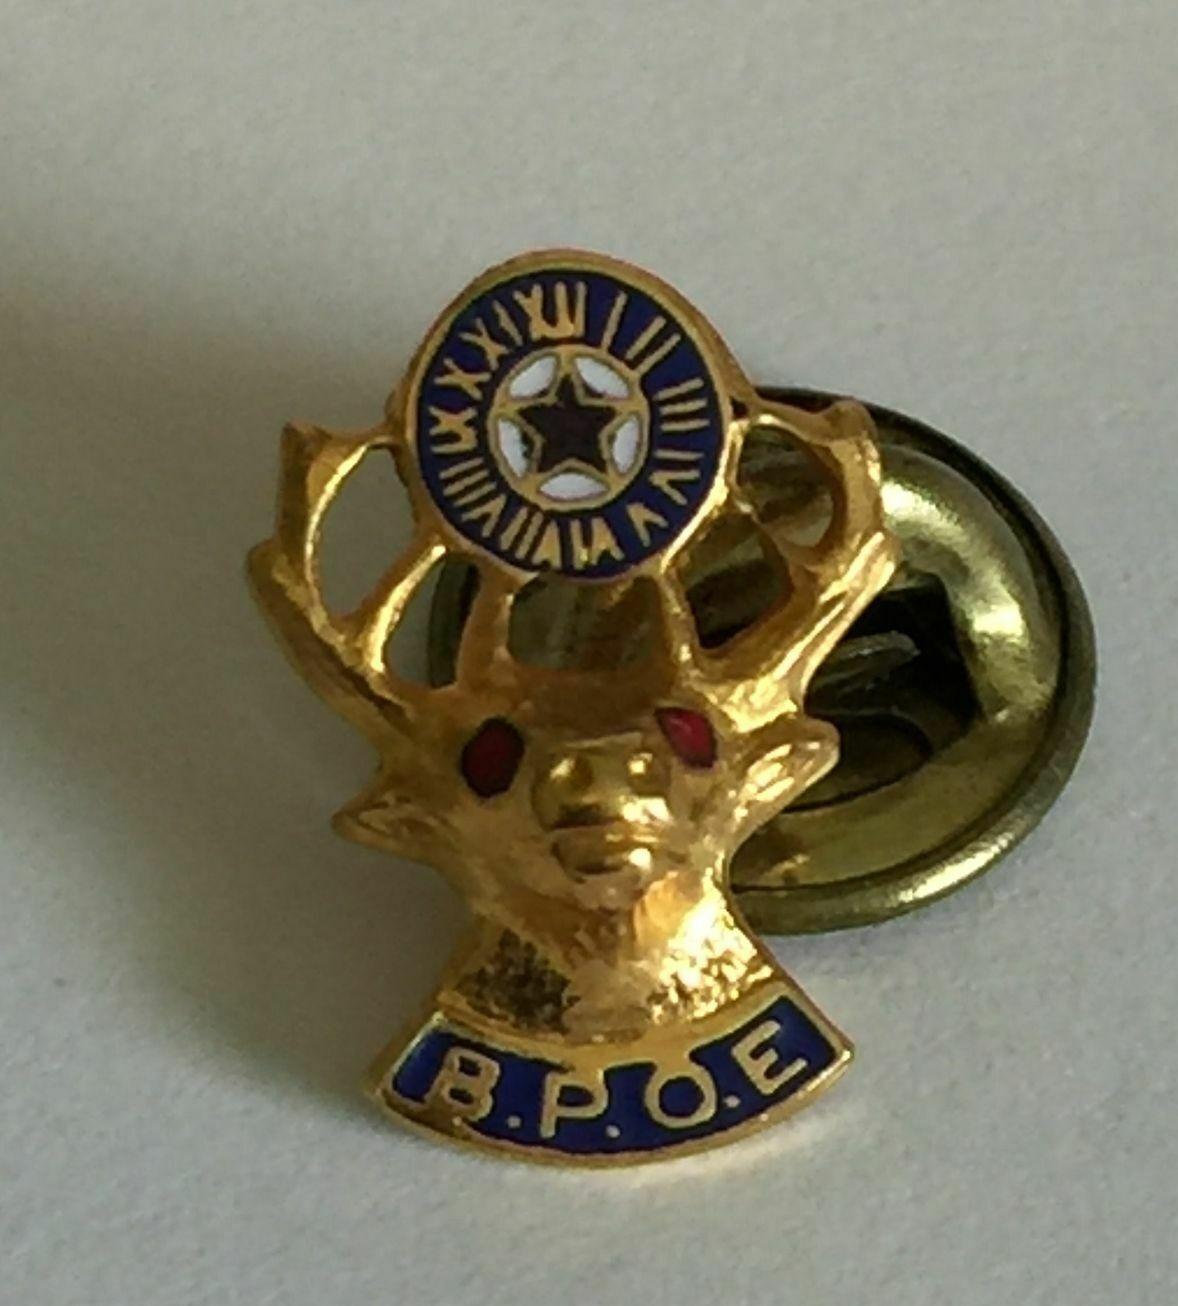 BPOE Lapel Button Pin Gold Tone-Red Eyes & Elks Clock Pin Back Pinback